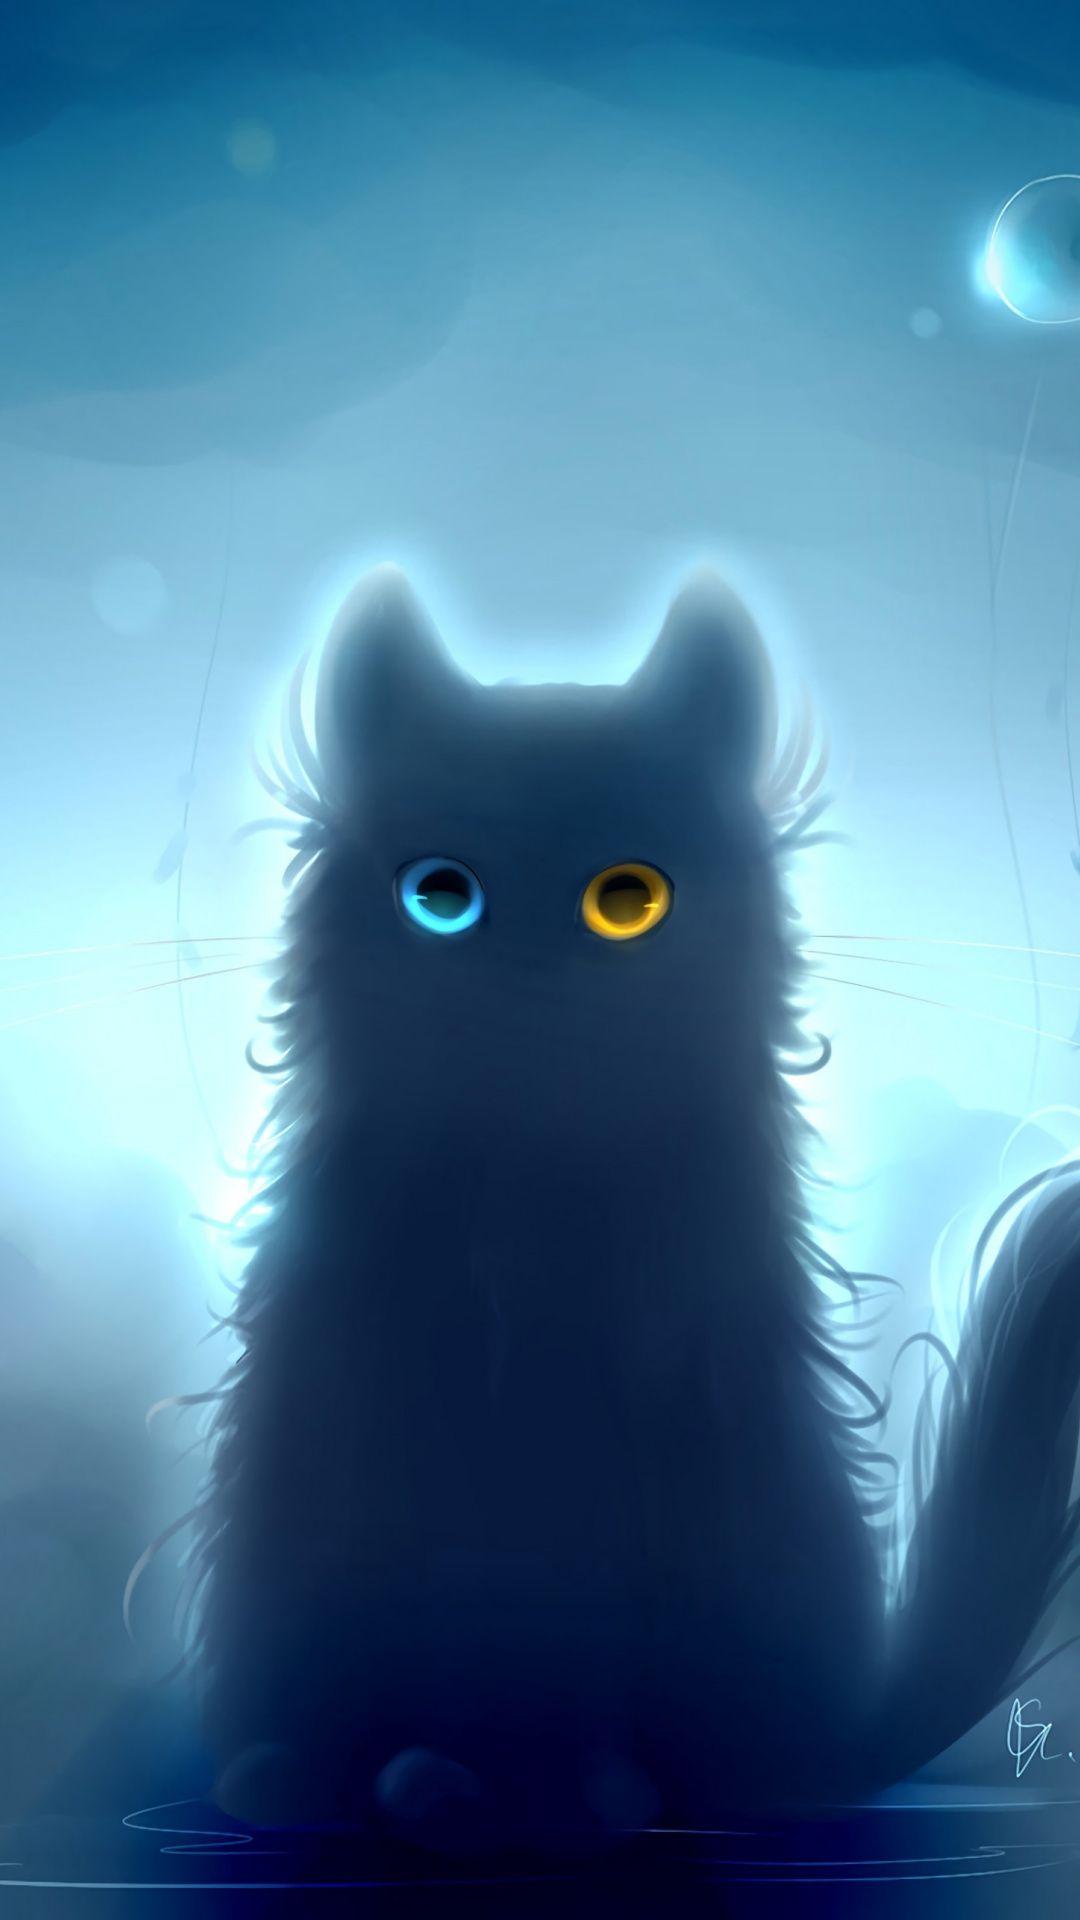 Art Heterochromia Black Cat Fantasy 1080x1920 Wallpaper Android Phone Wallpaper Cat Wallpaper Art